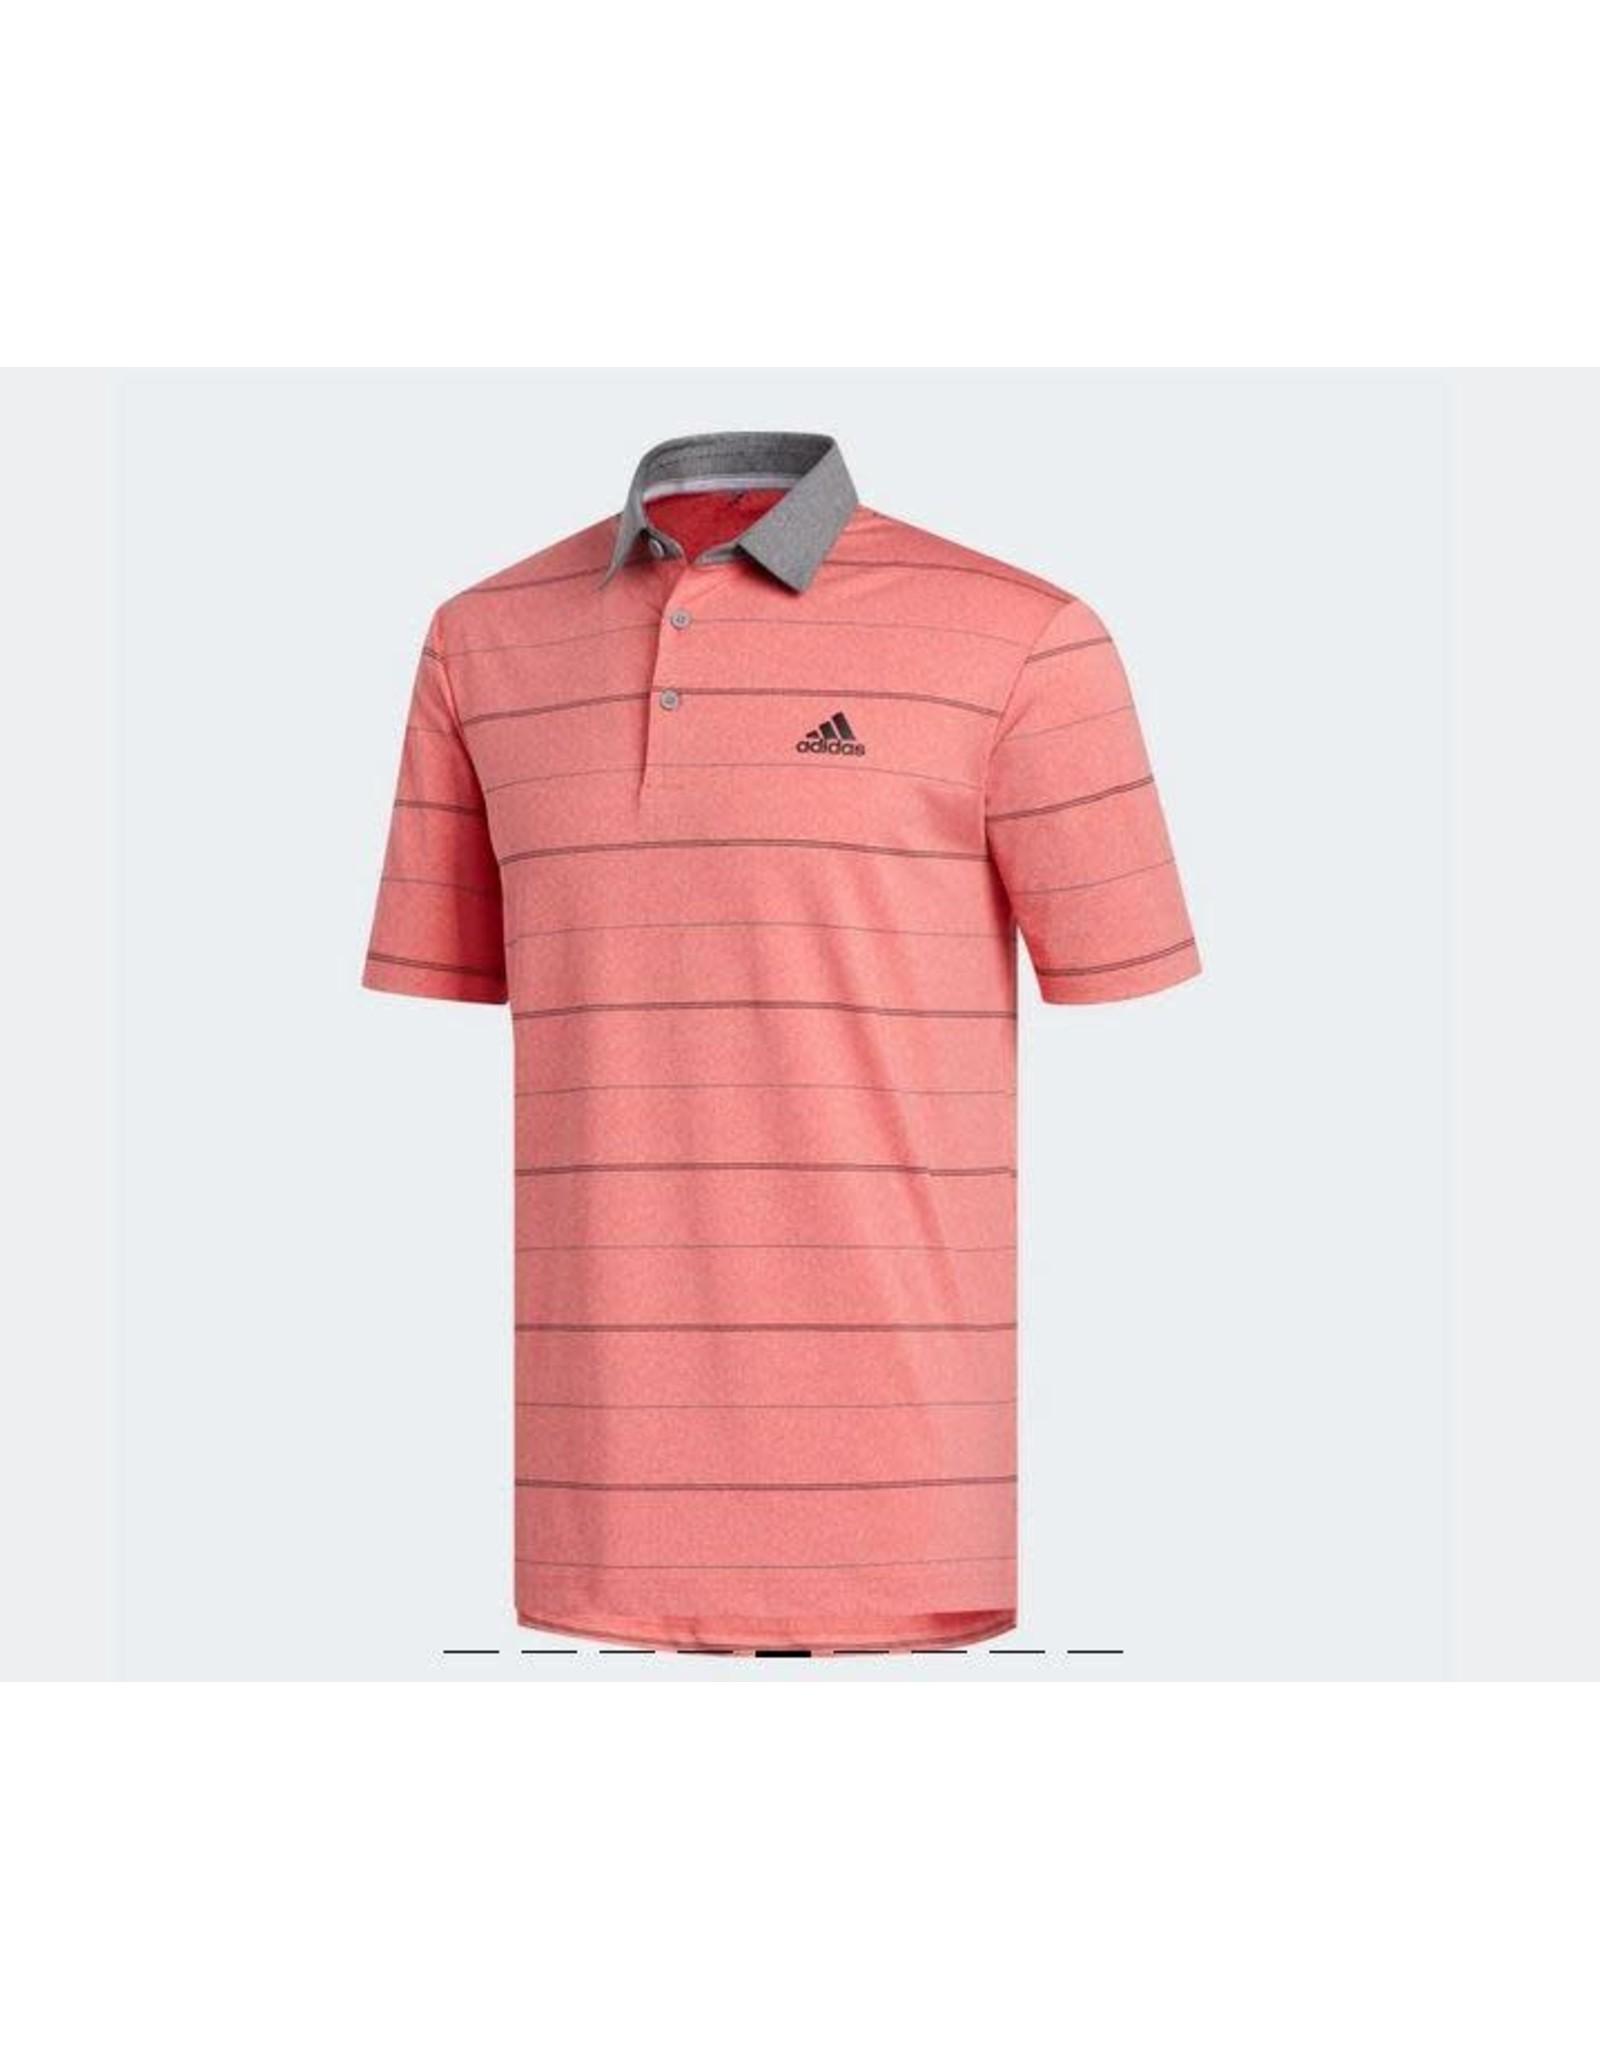 Adidas Adidas Polo ULT 365 (FJ9951)